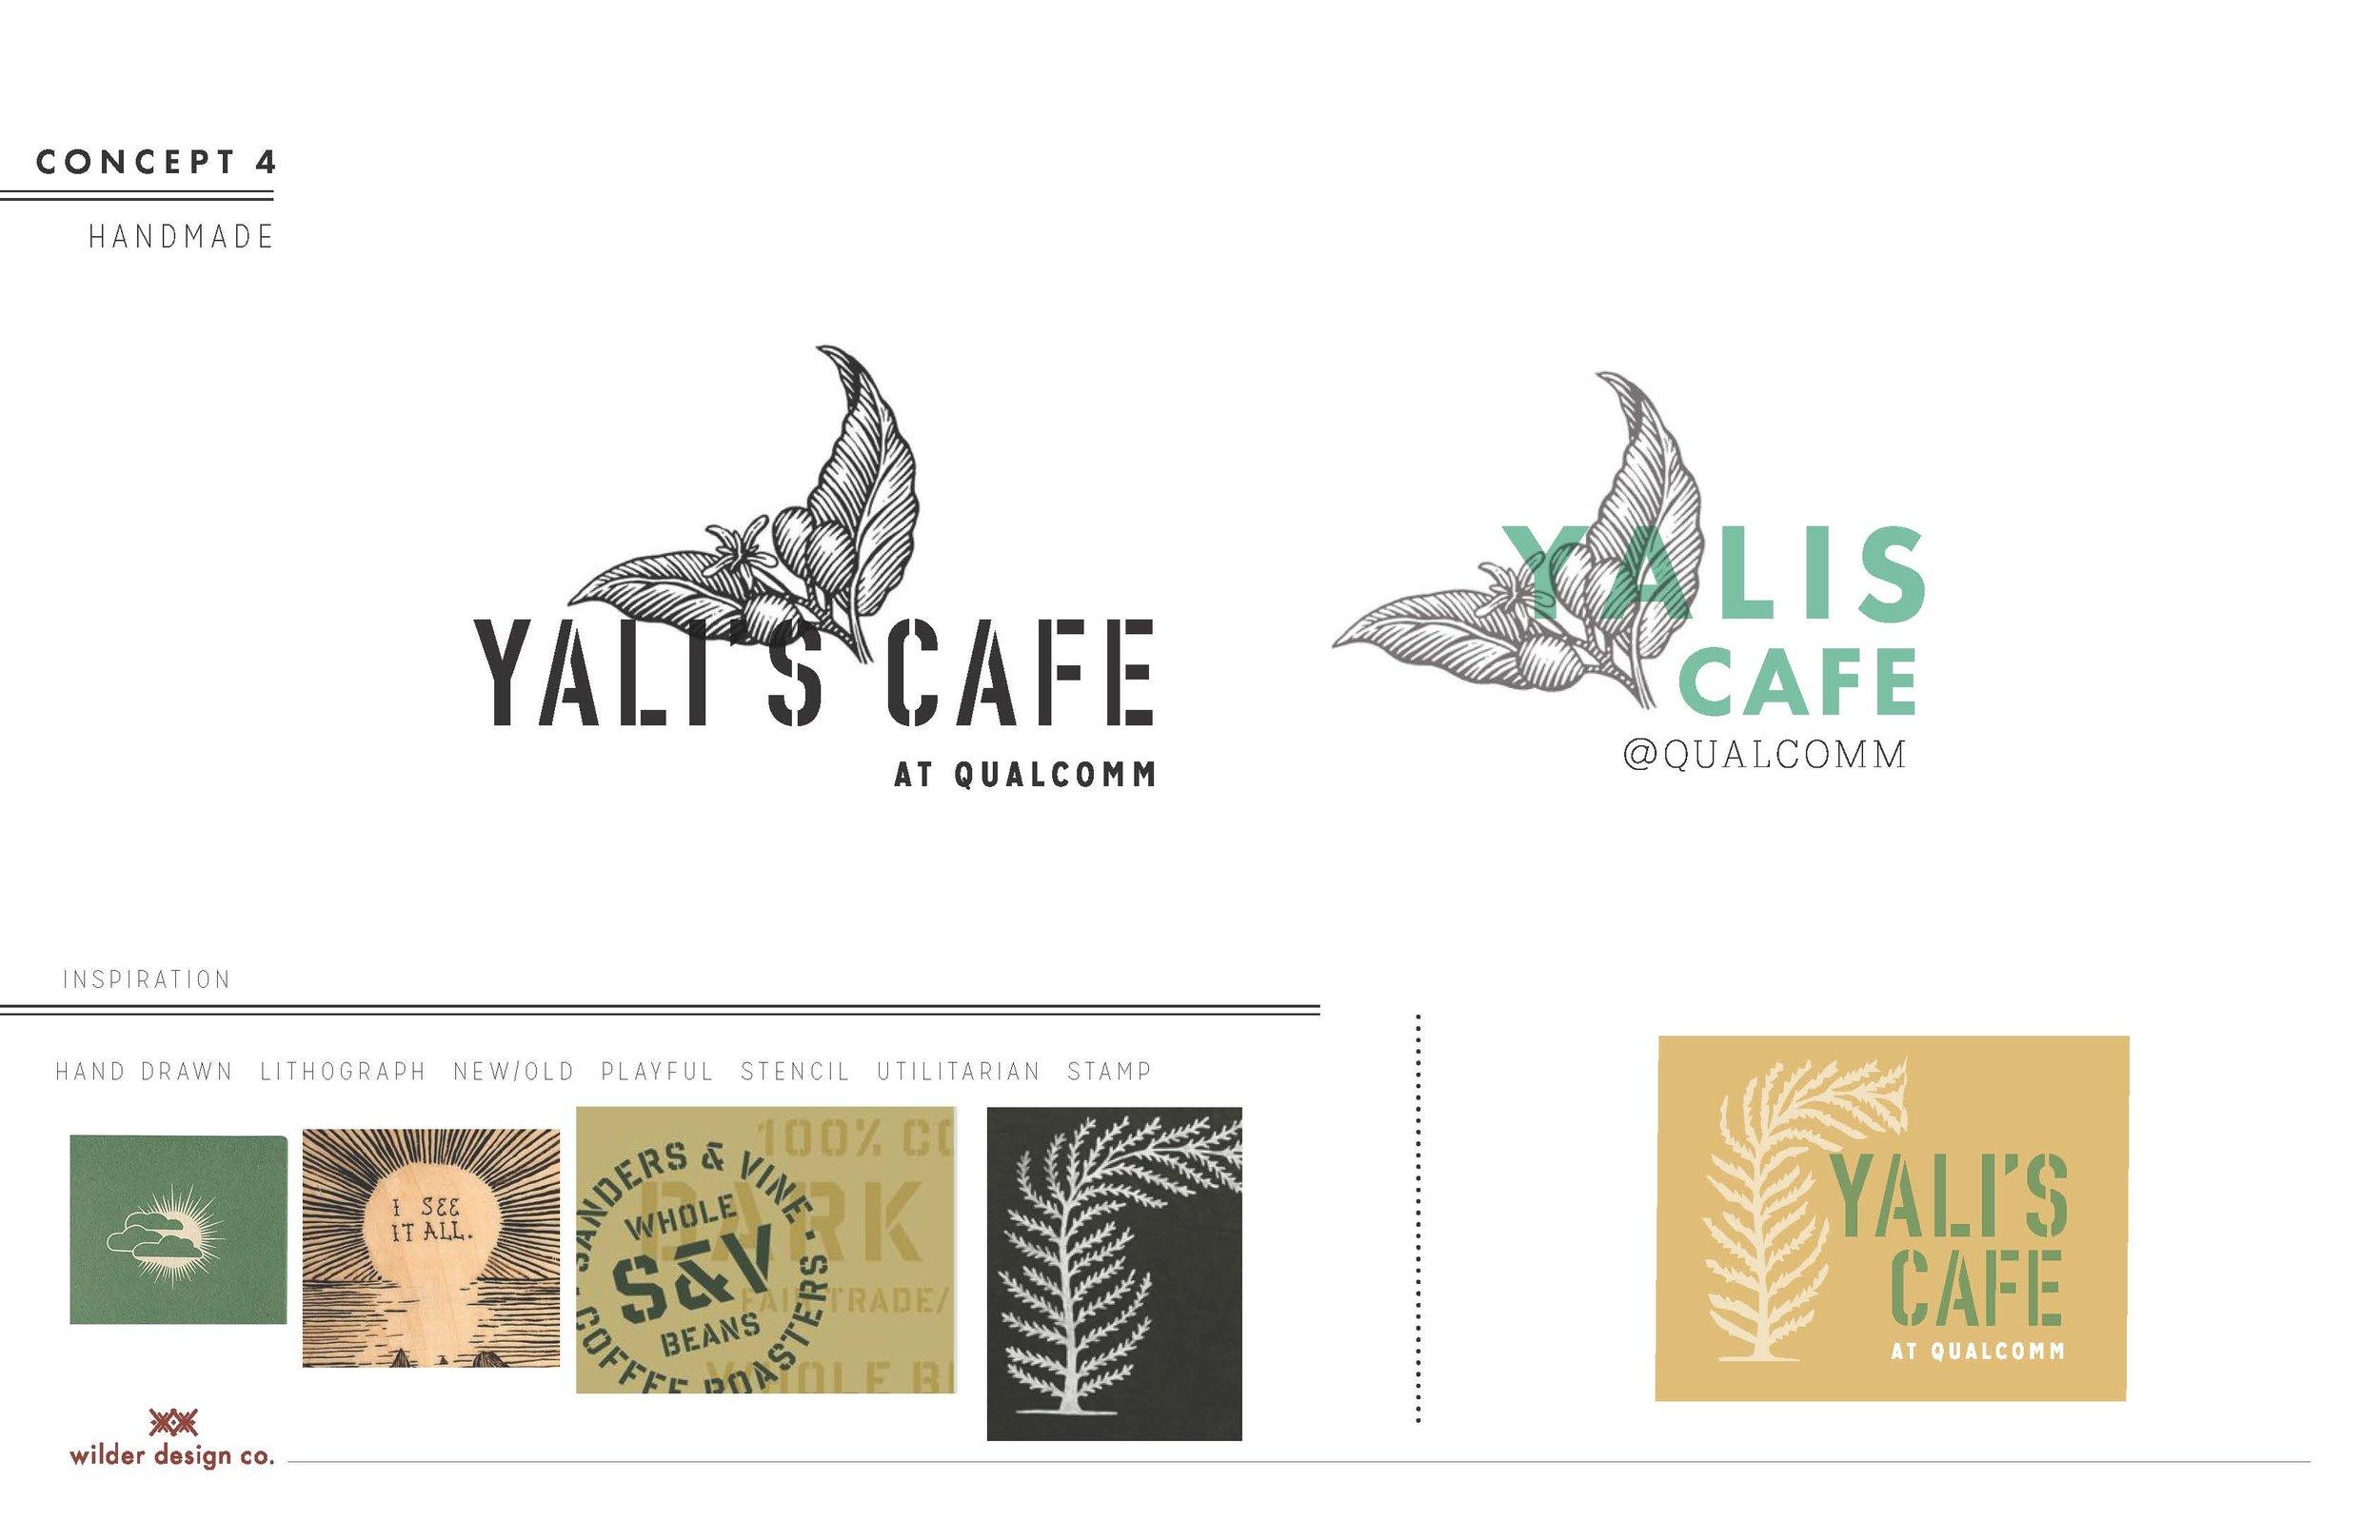 Yalis_Branding_Rd1_090117_v1_Page_8.jpg